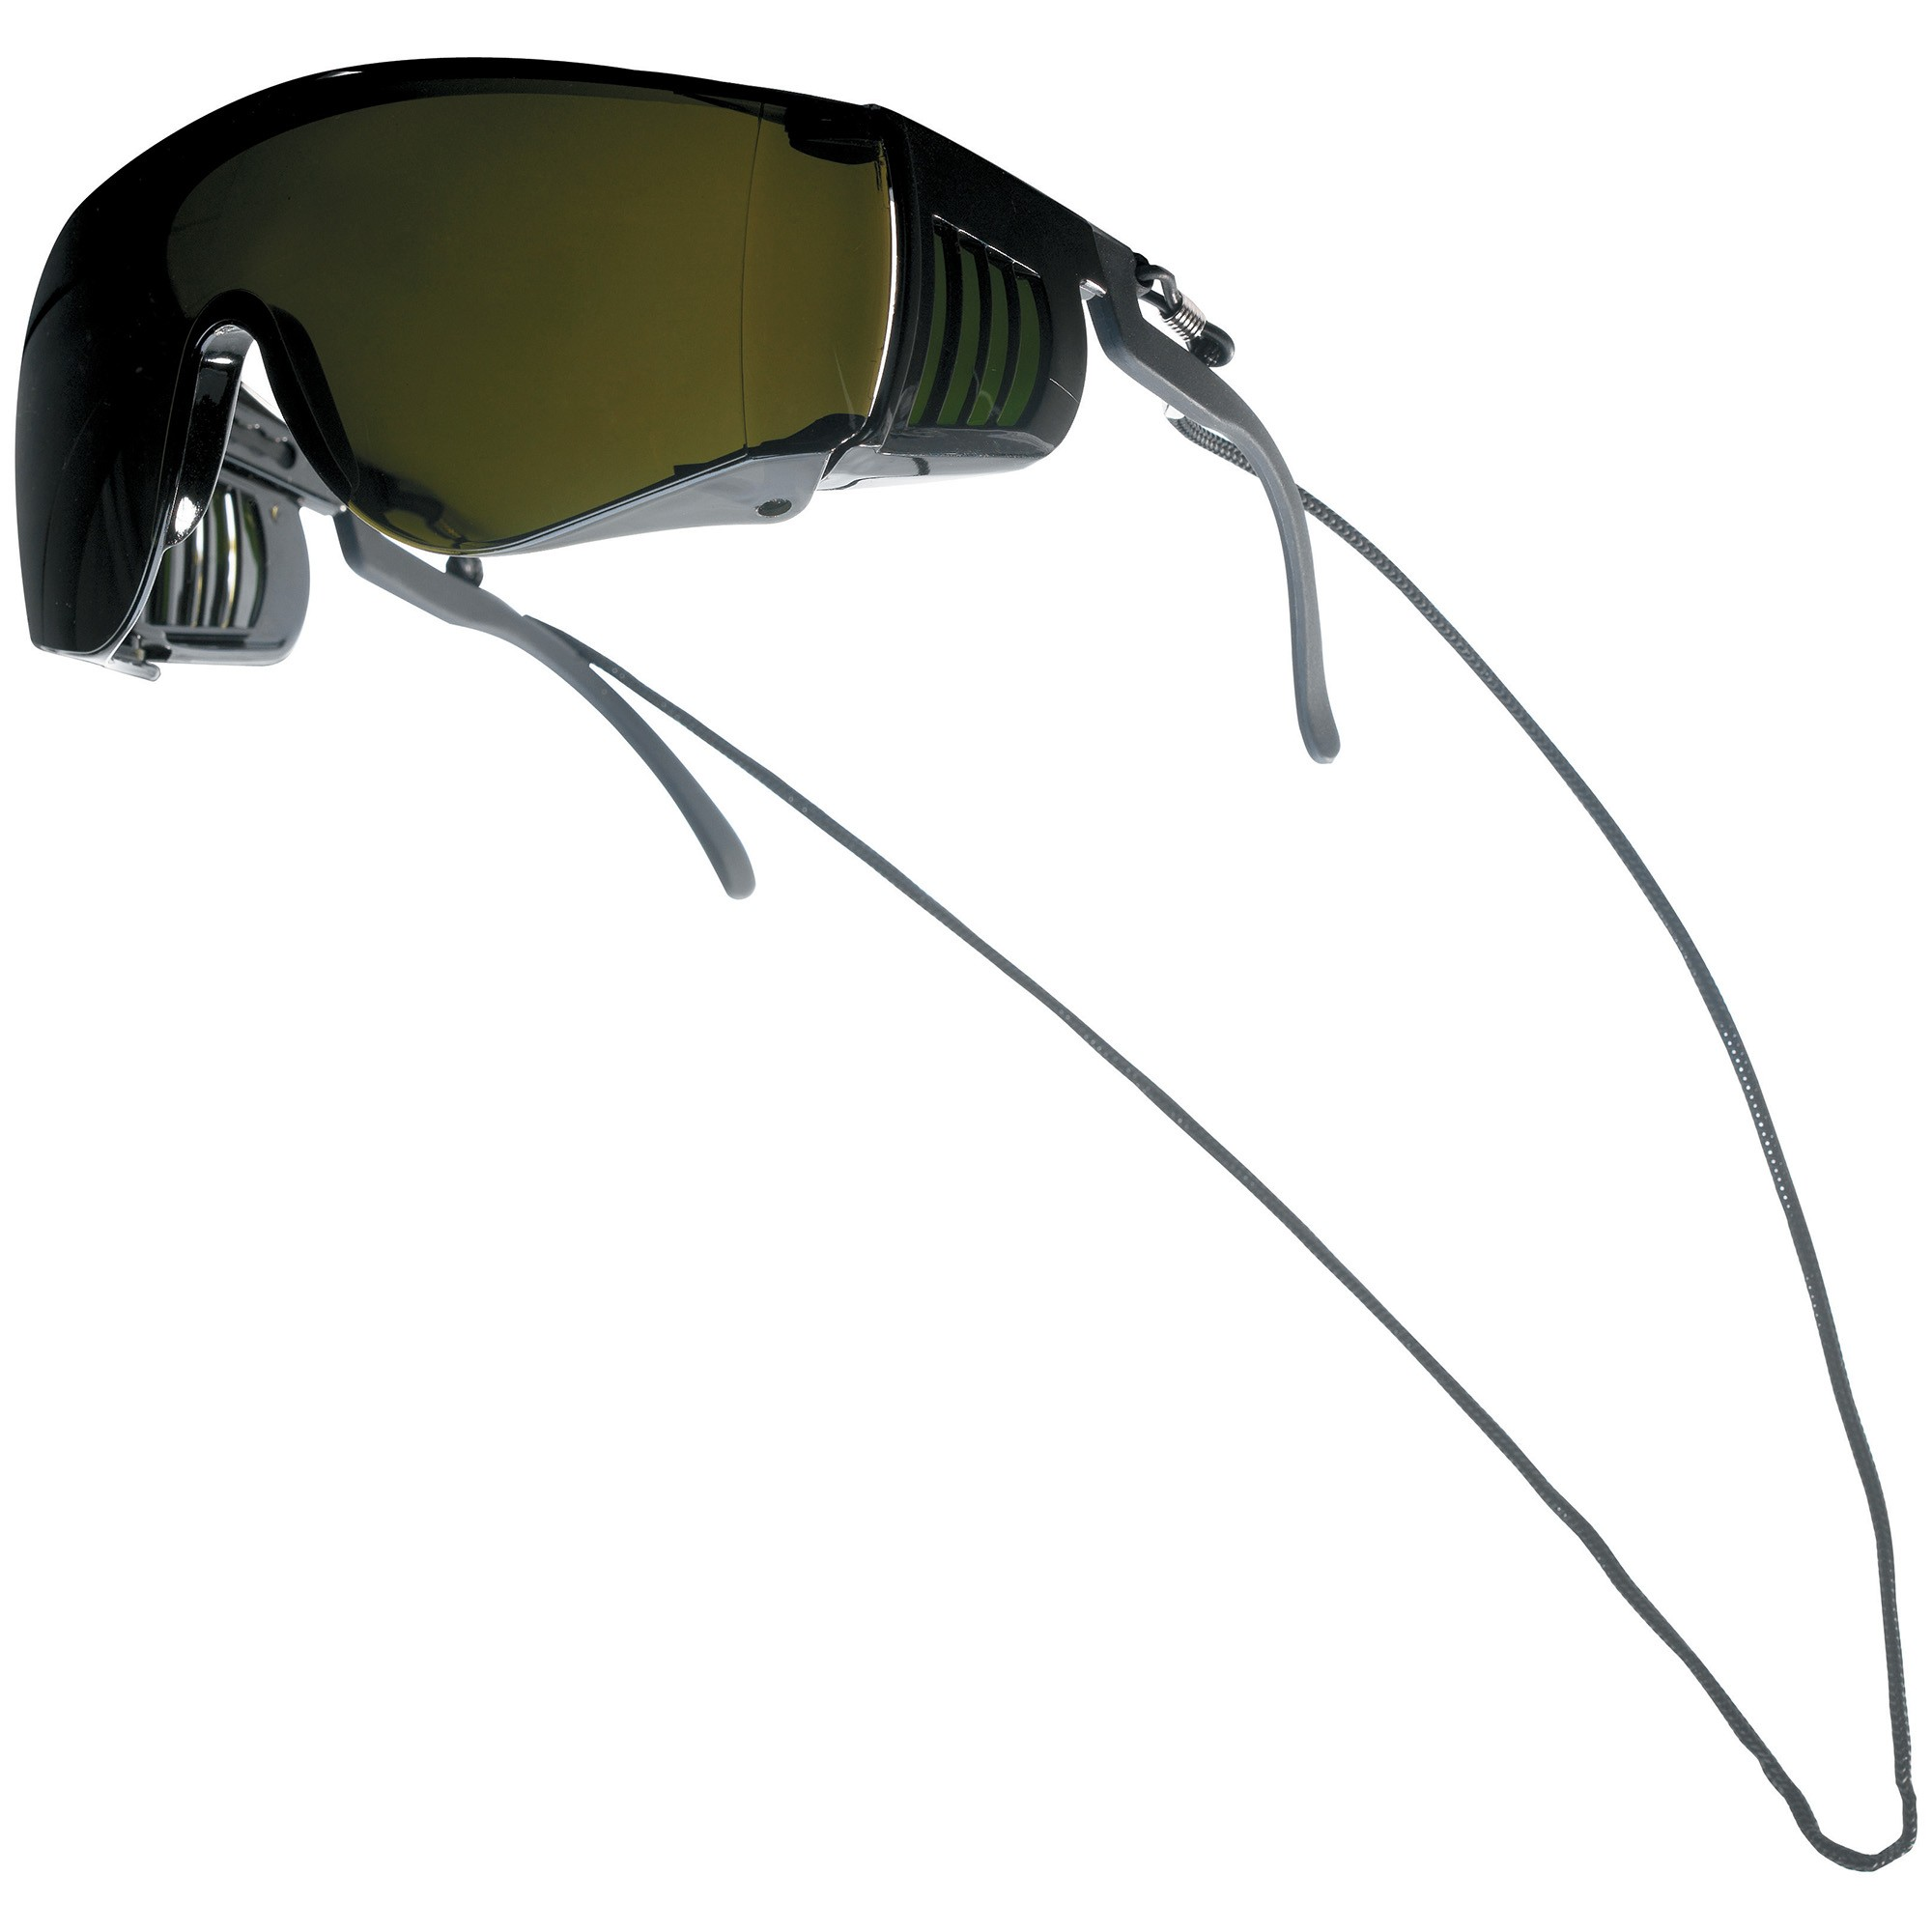 Eyeglass Frame Welding : Bolle 40056 Override Eyewear - Welding Shade 5 ...